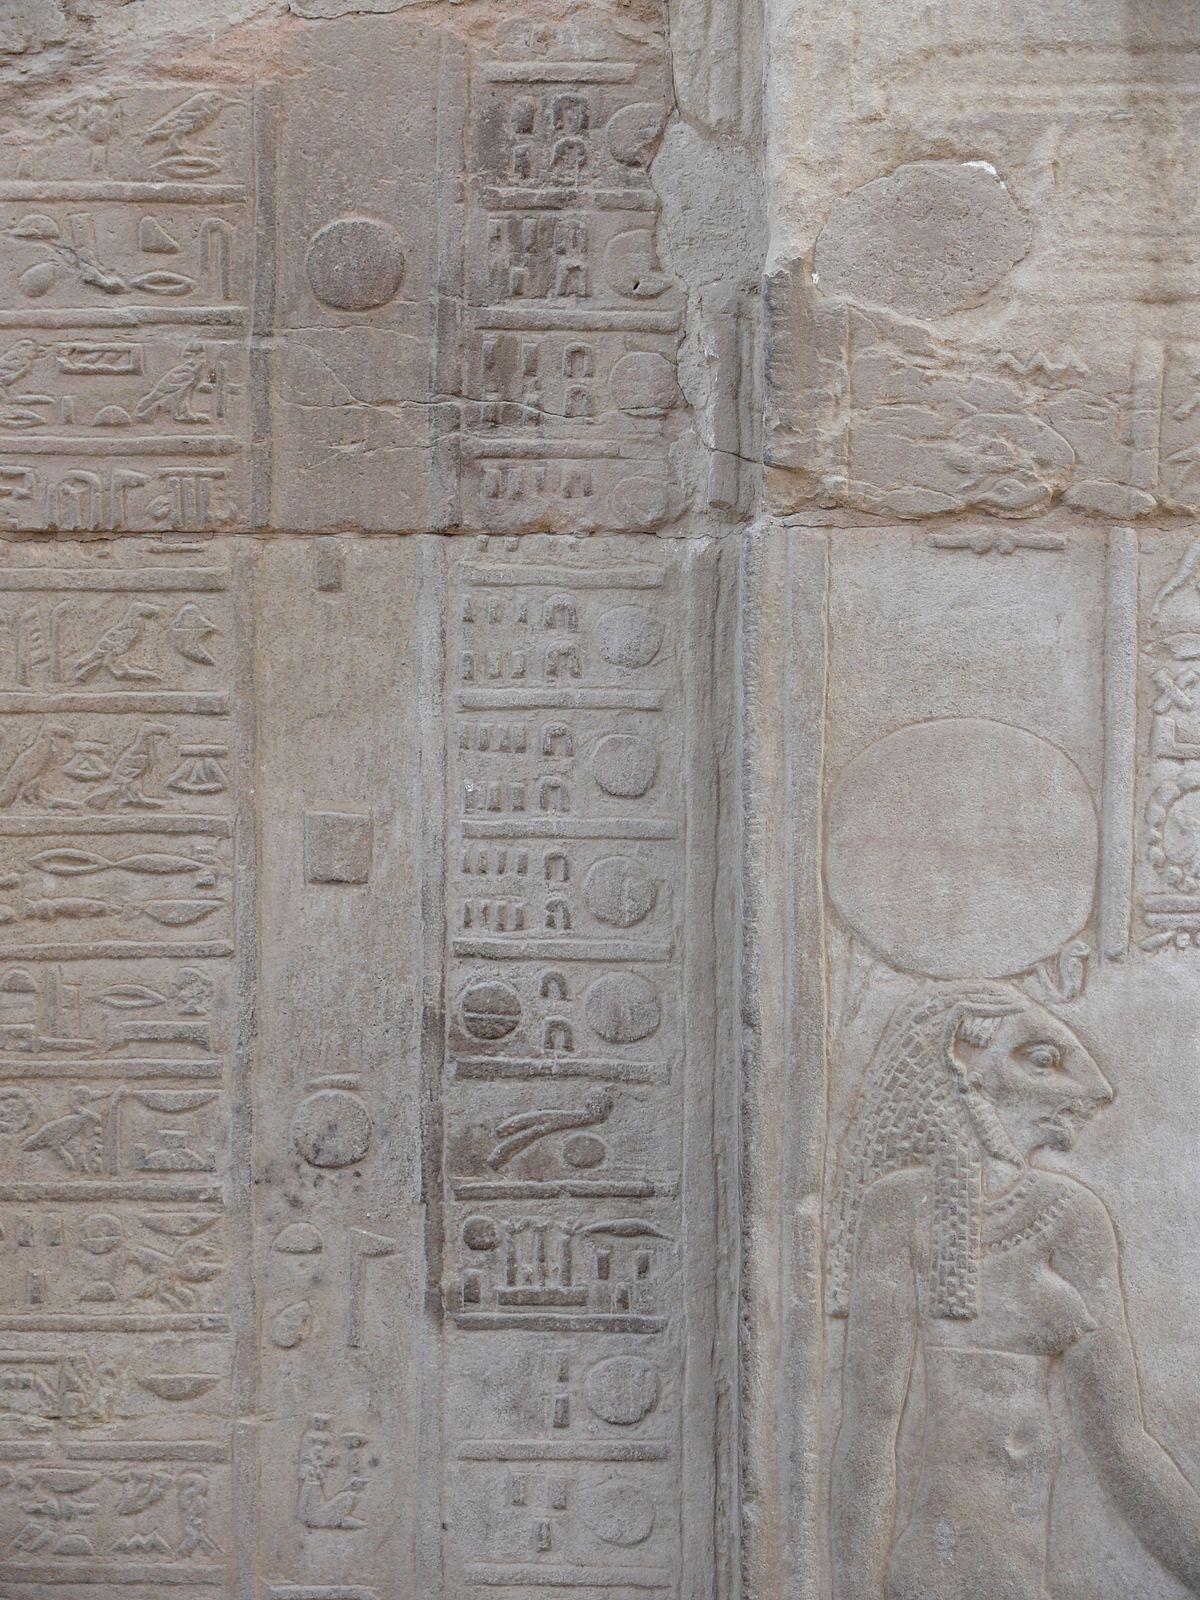 Egyptian Calendar - Wikipedia